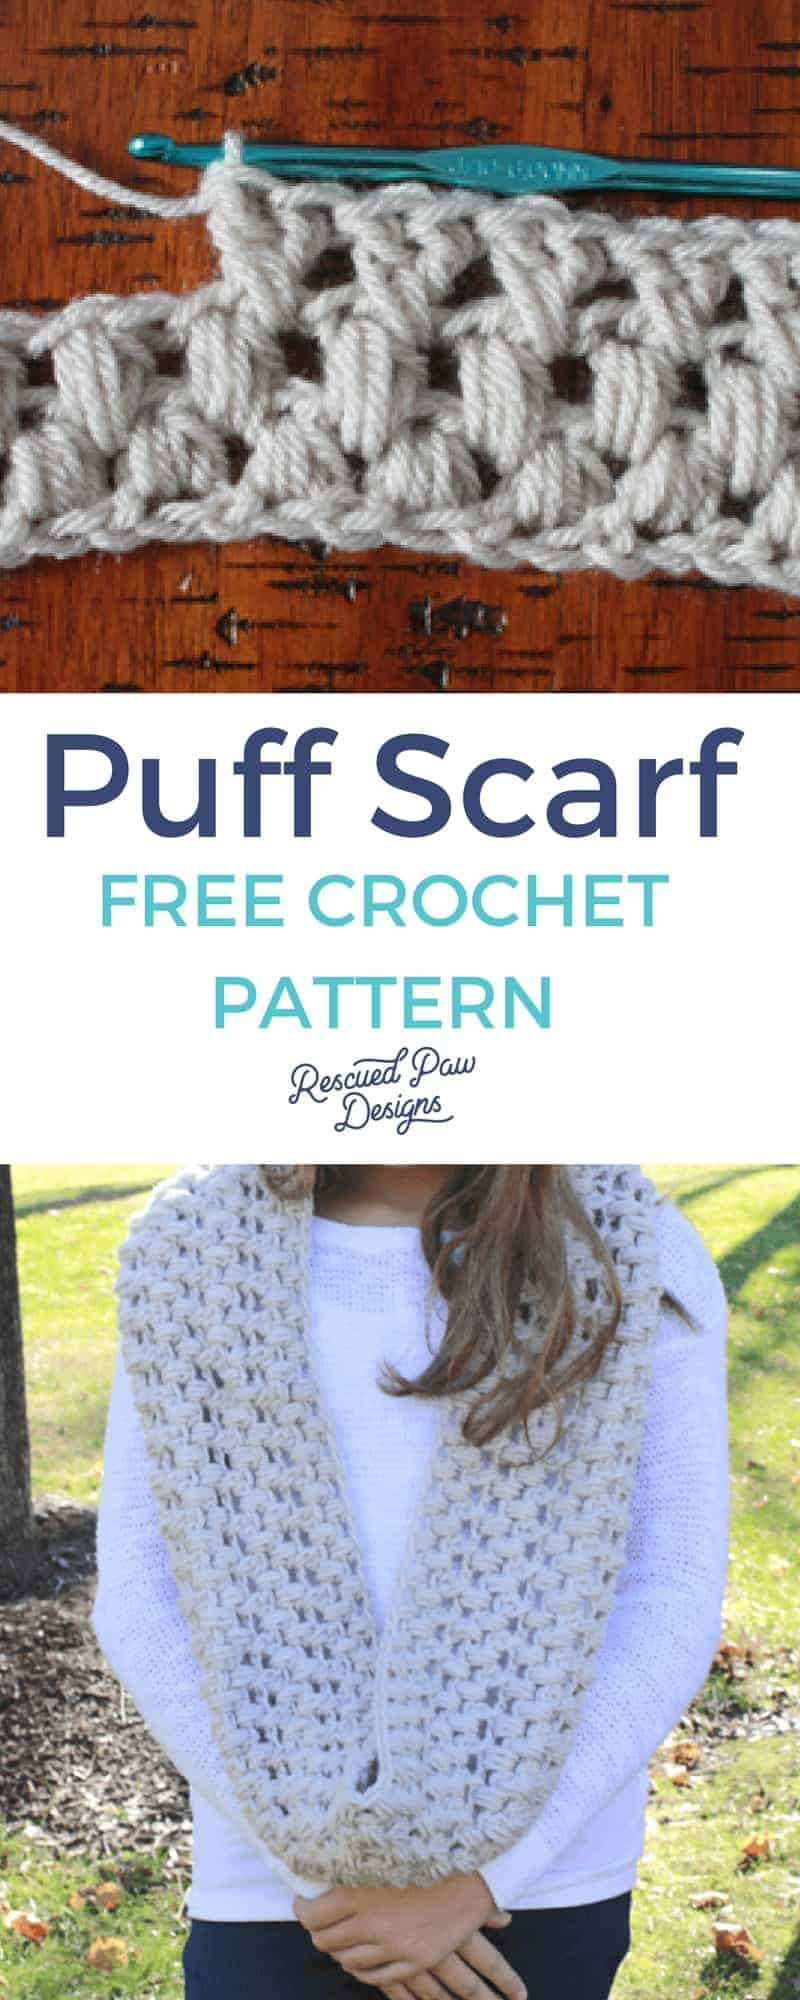 Crochet Puff Stitch Scarf Rescued Paw Designs Crochet